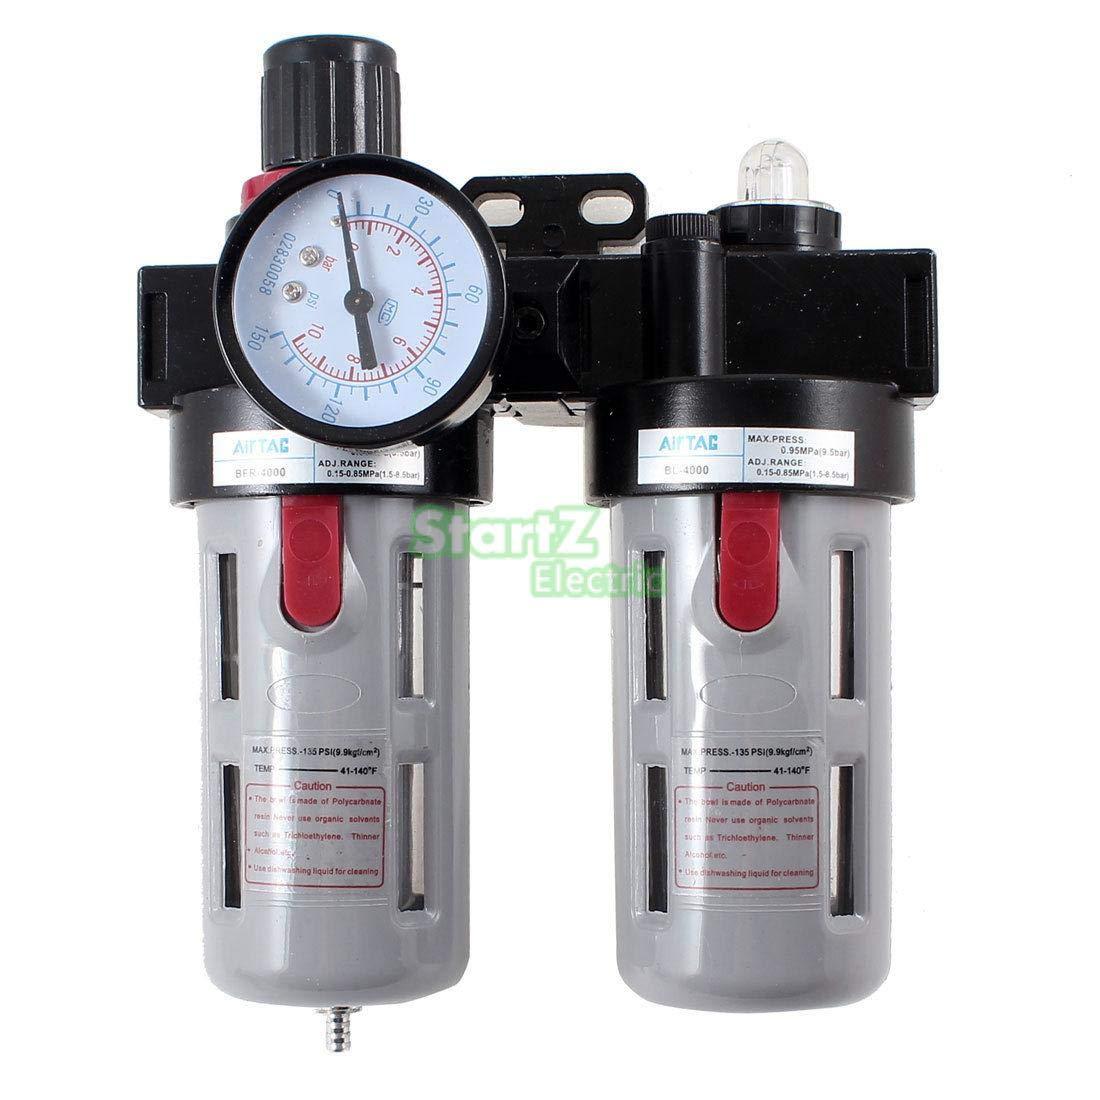 Fevas BFC4000 Air Source Treatment Filter Regulator Lubricator Combination